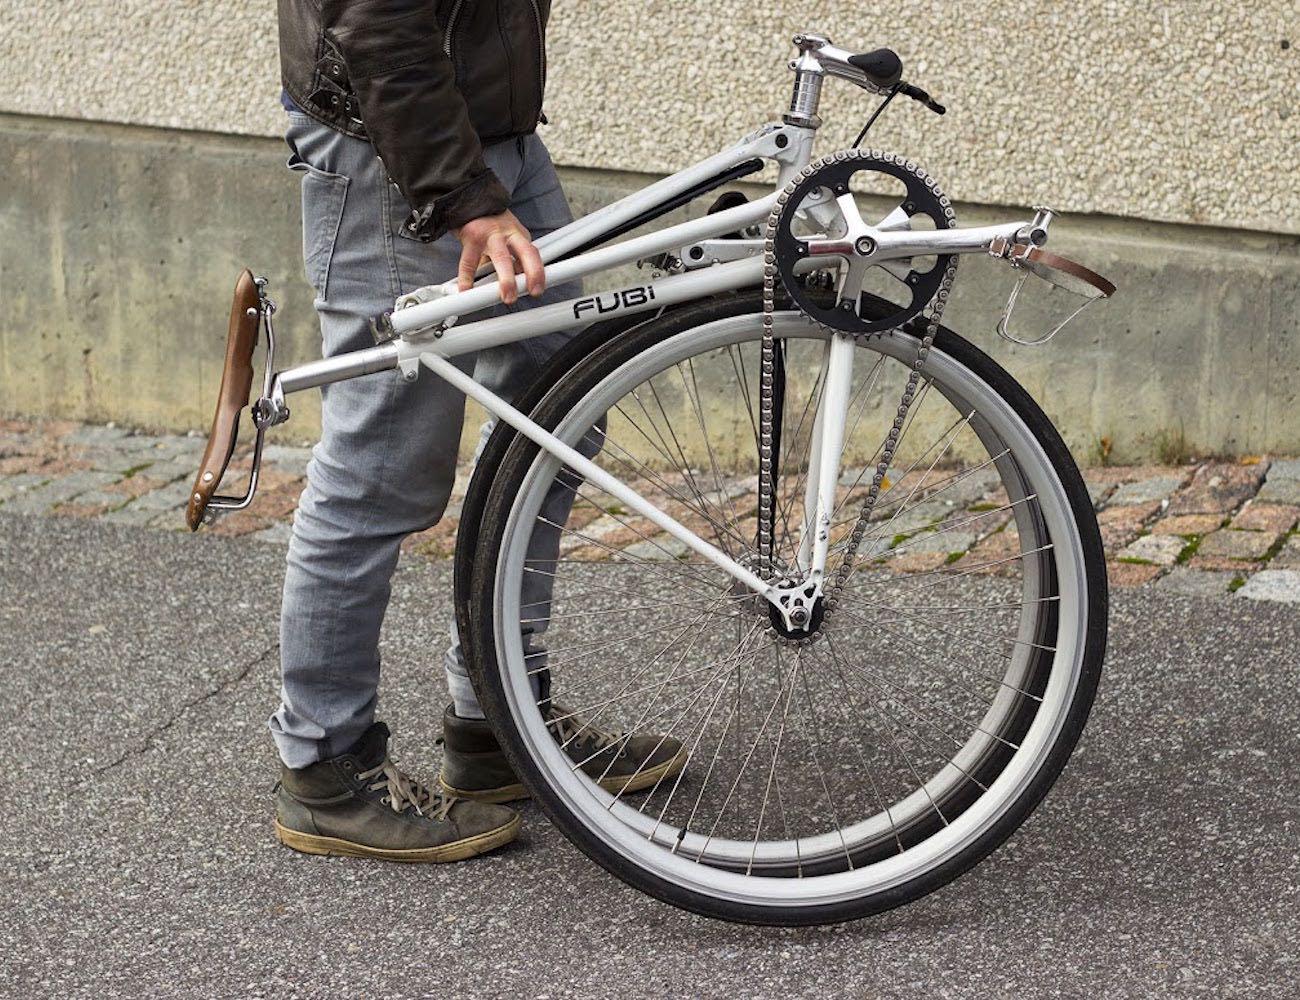 fubi fixie transform your bike into a folding bike review. Black Bedroom Furniture Sets. Home Design Ideas